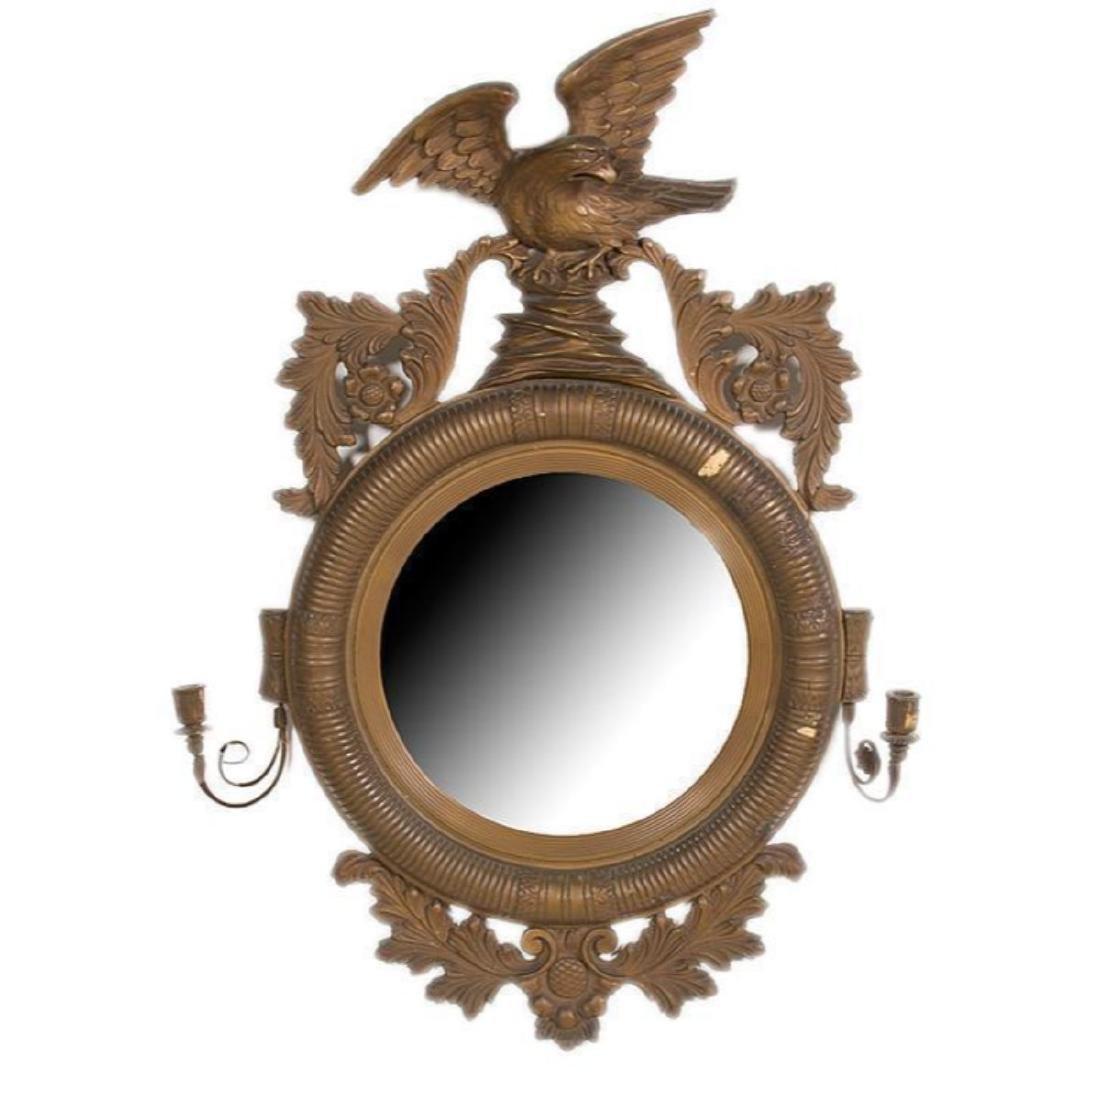 19thc Regency-Style Gilt Wood Convex Eagle Mirror - 2